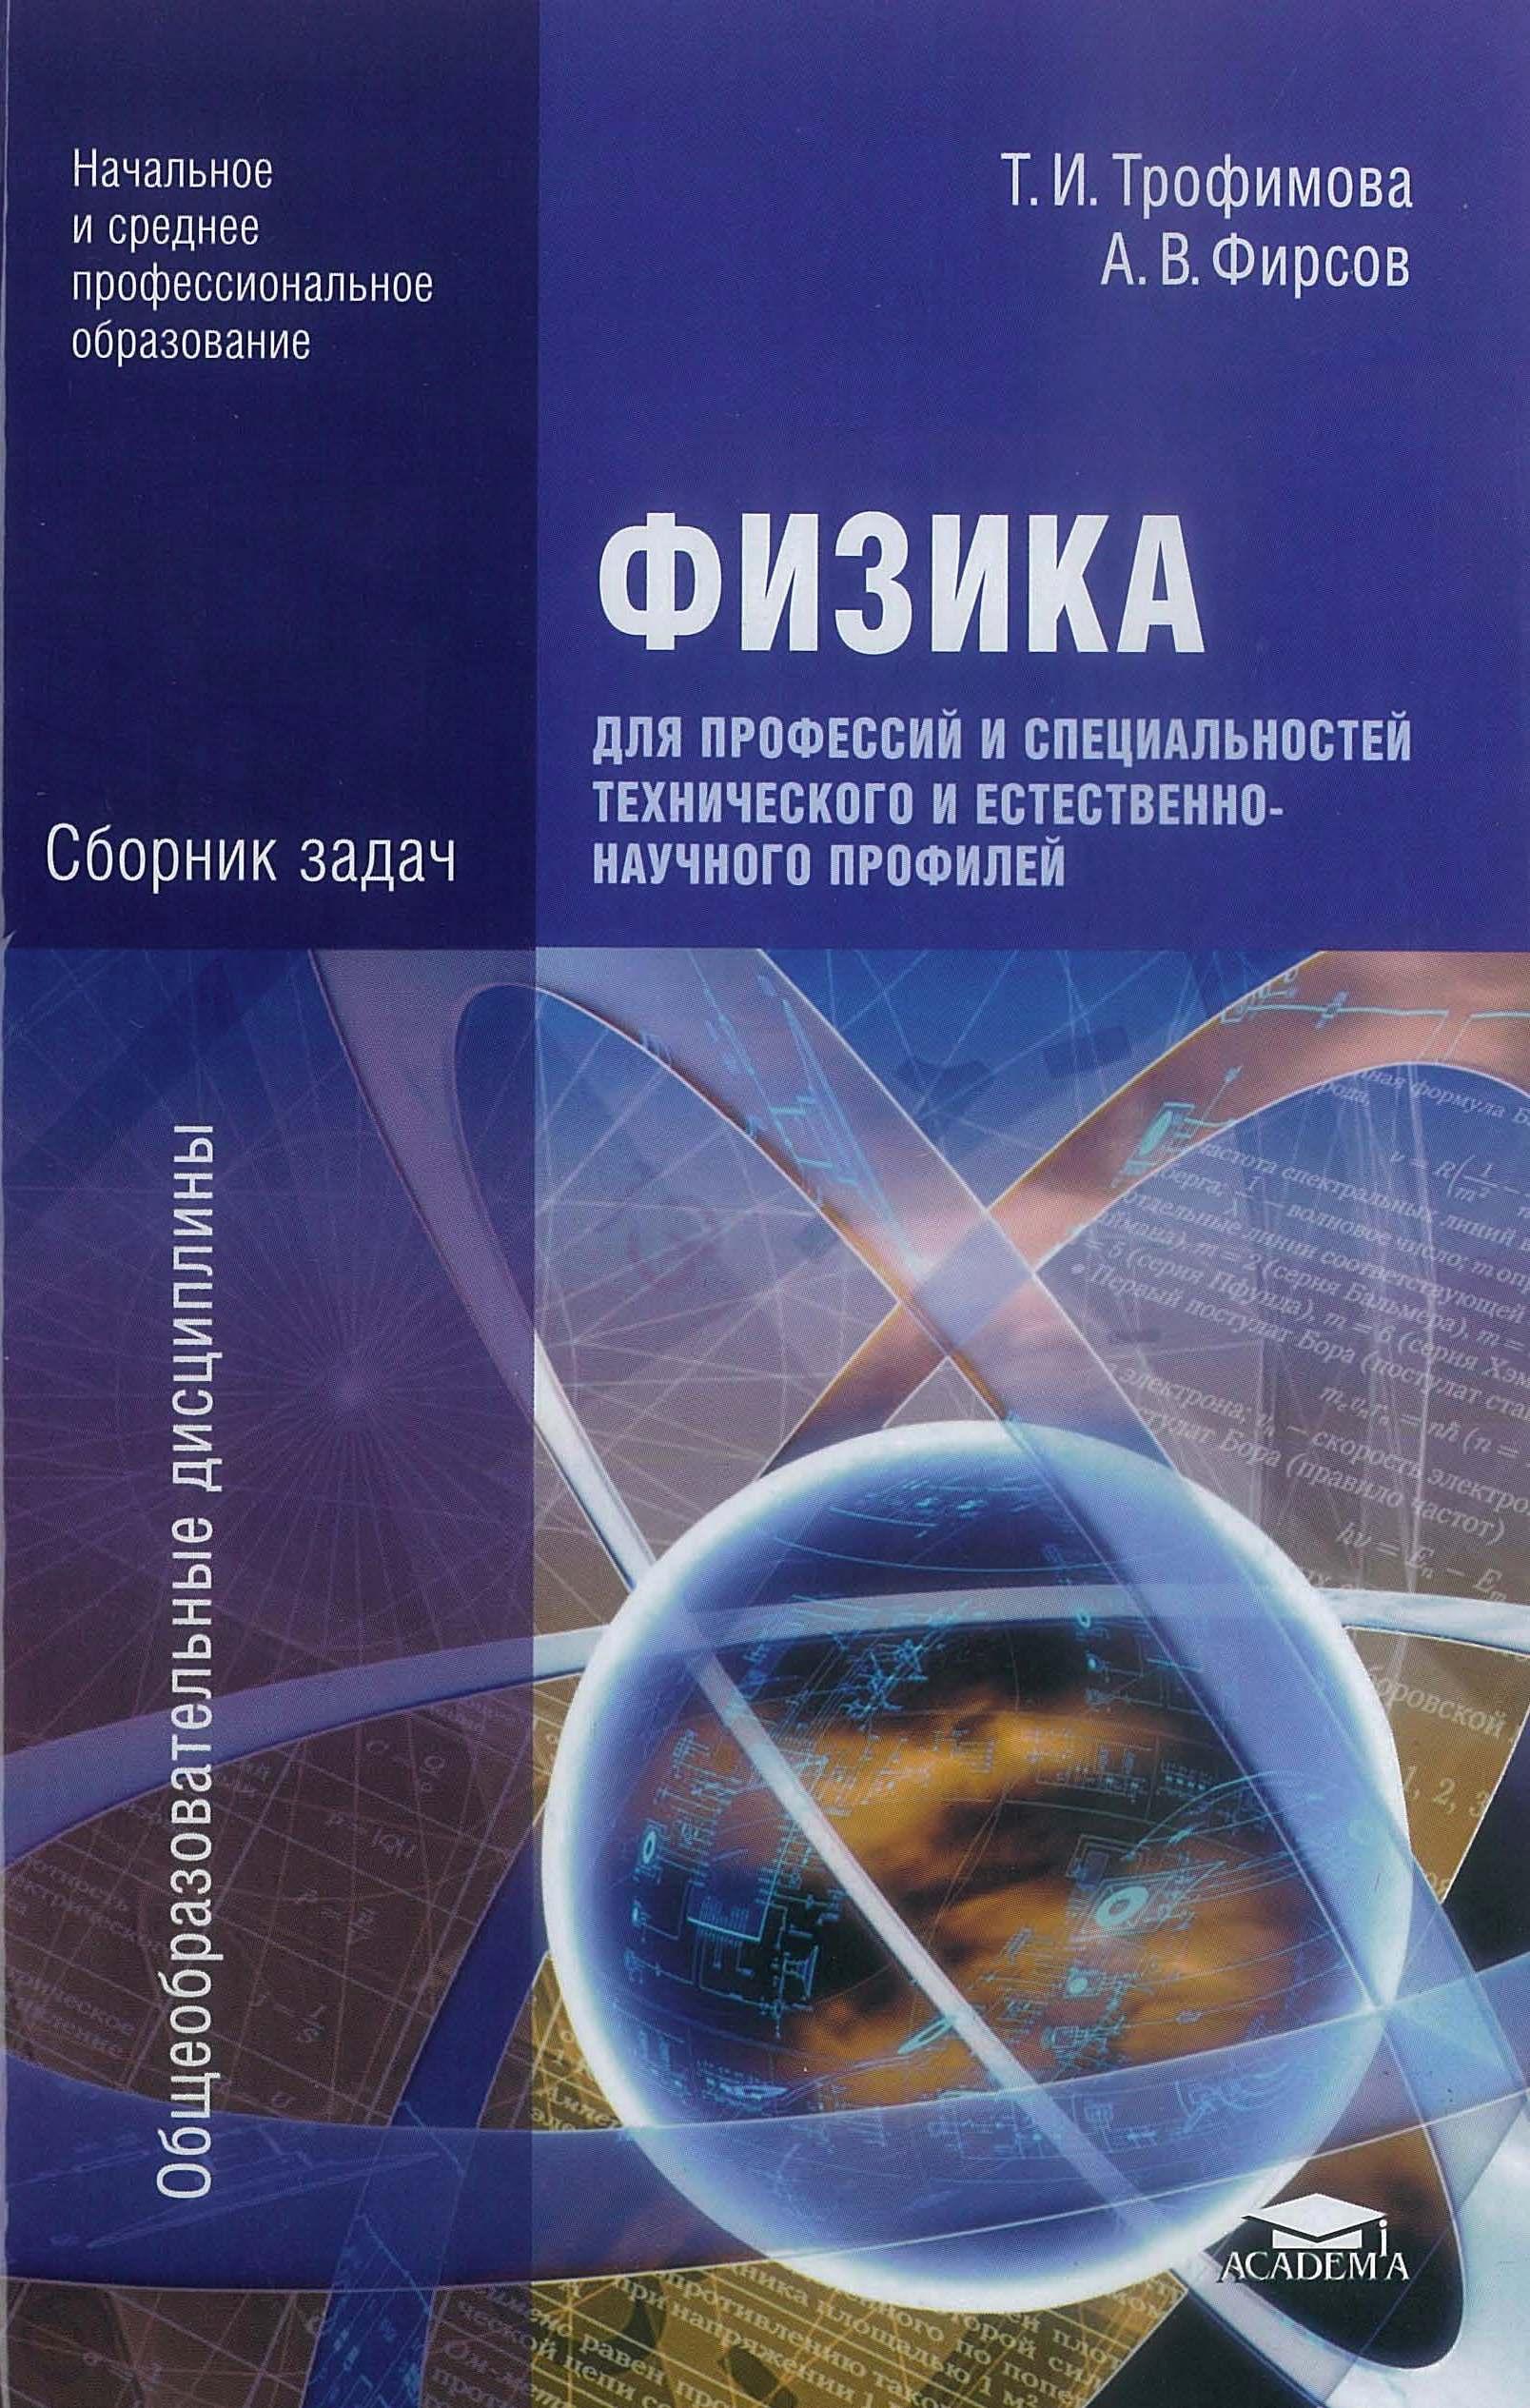 Сборник Задач По Физике Трофимова Фирсов Научного Профили Гдз